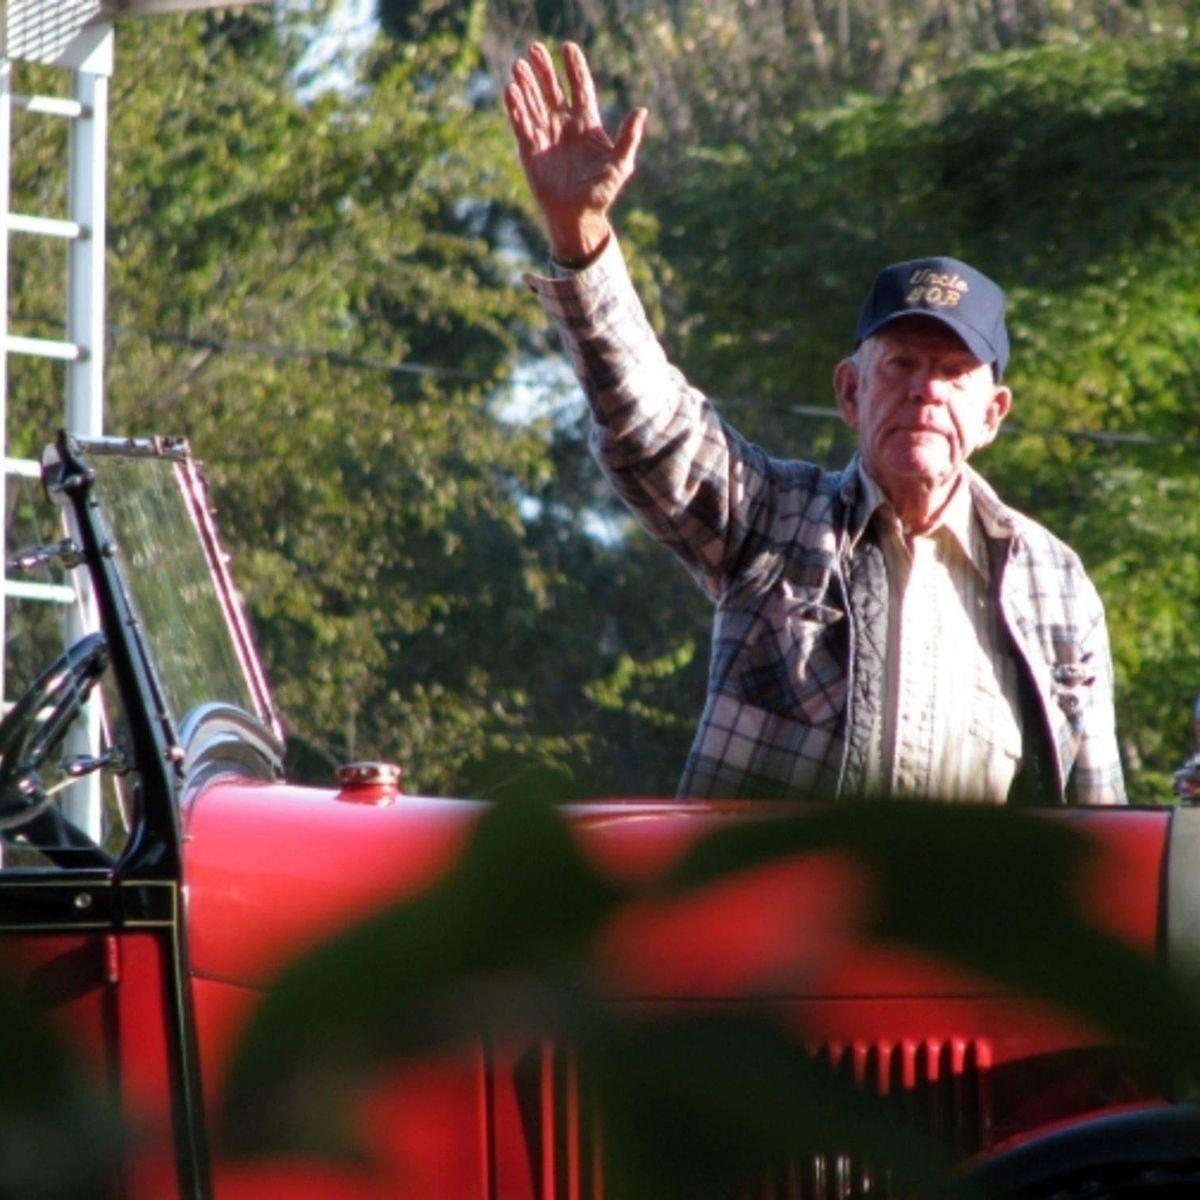 Korean War vet, founding member of antique car show fondly remembered in Winnsboro